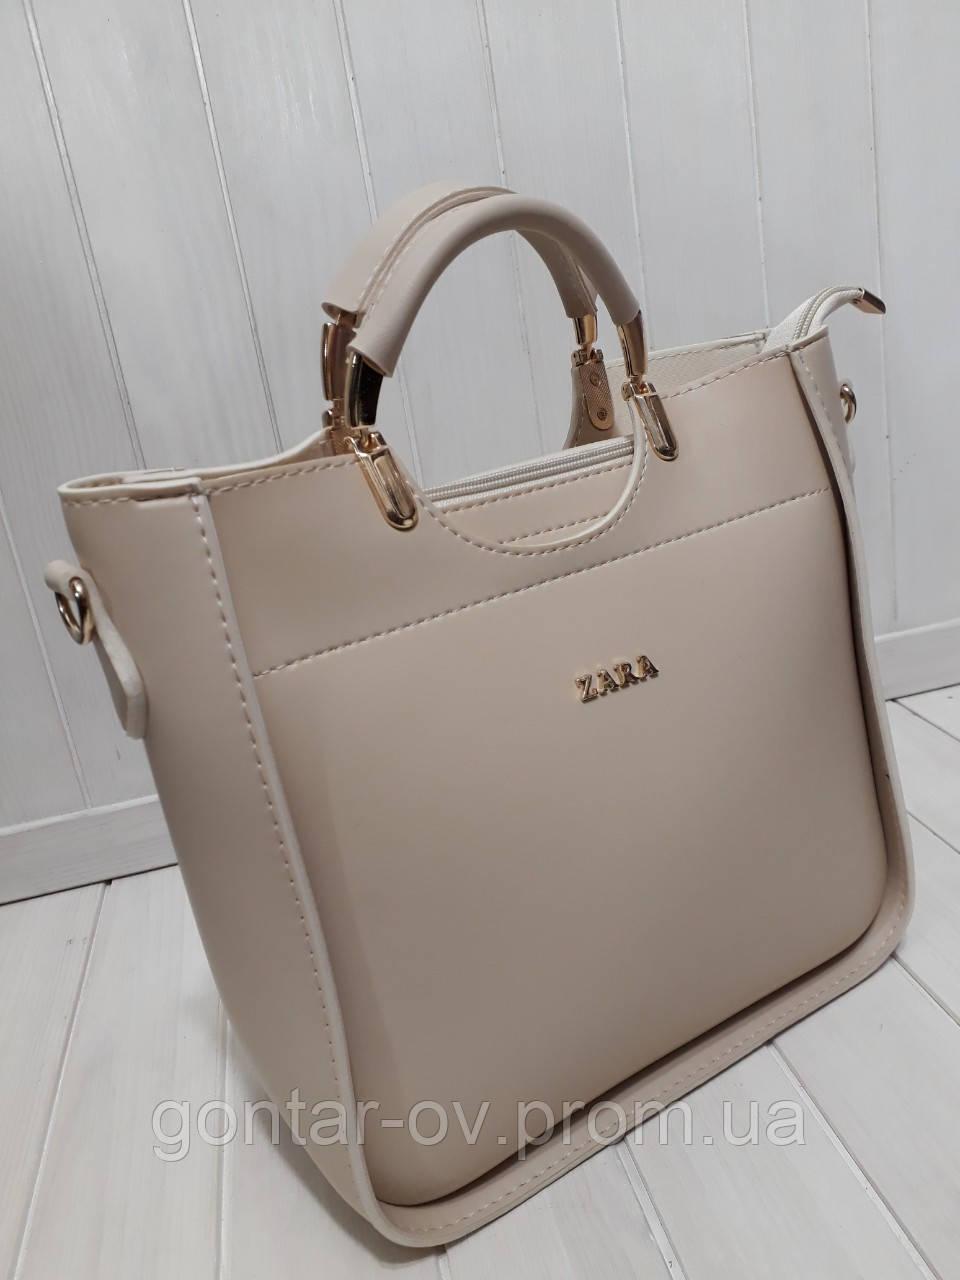 Женская сумка Zara бежевая